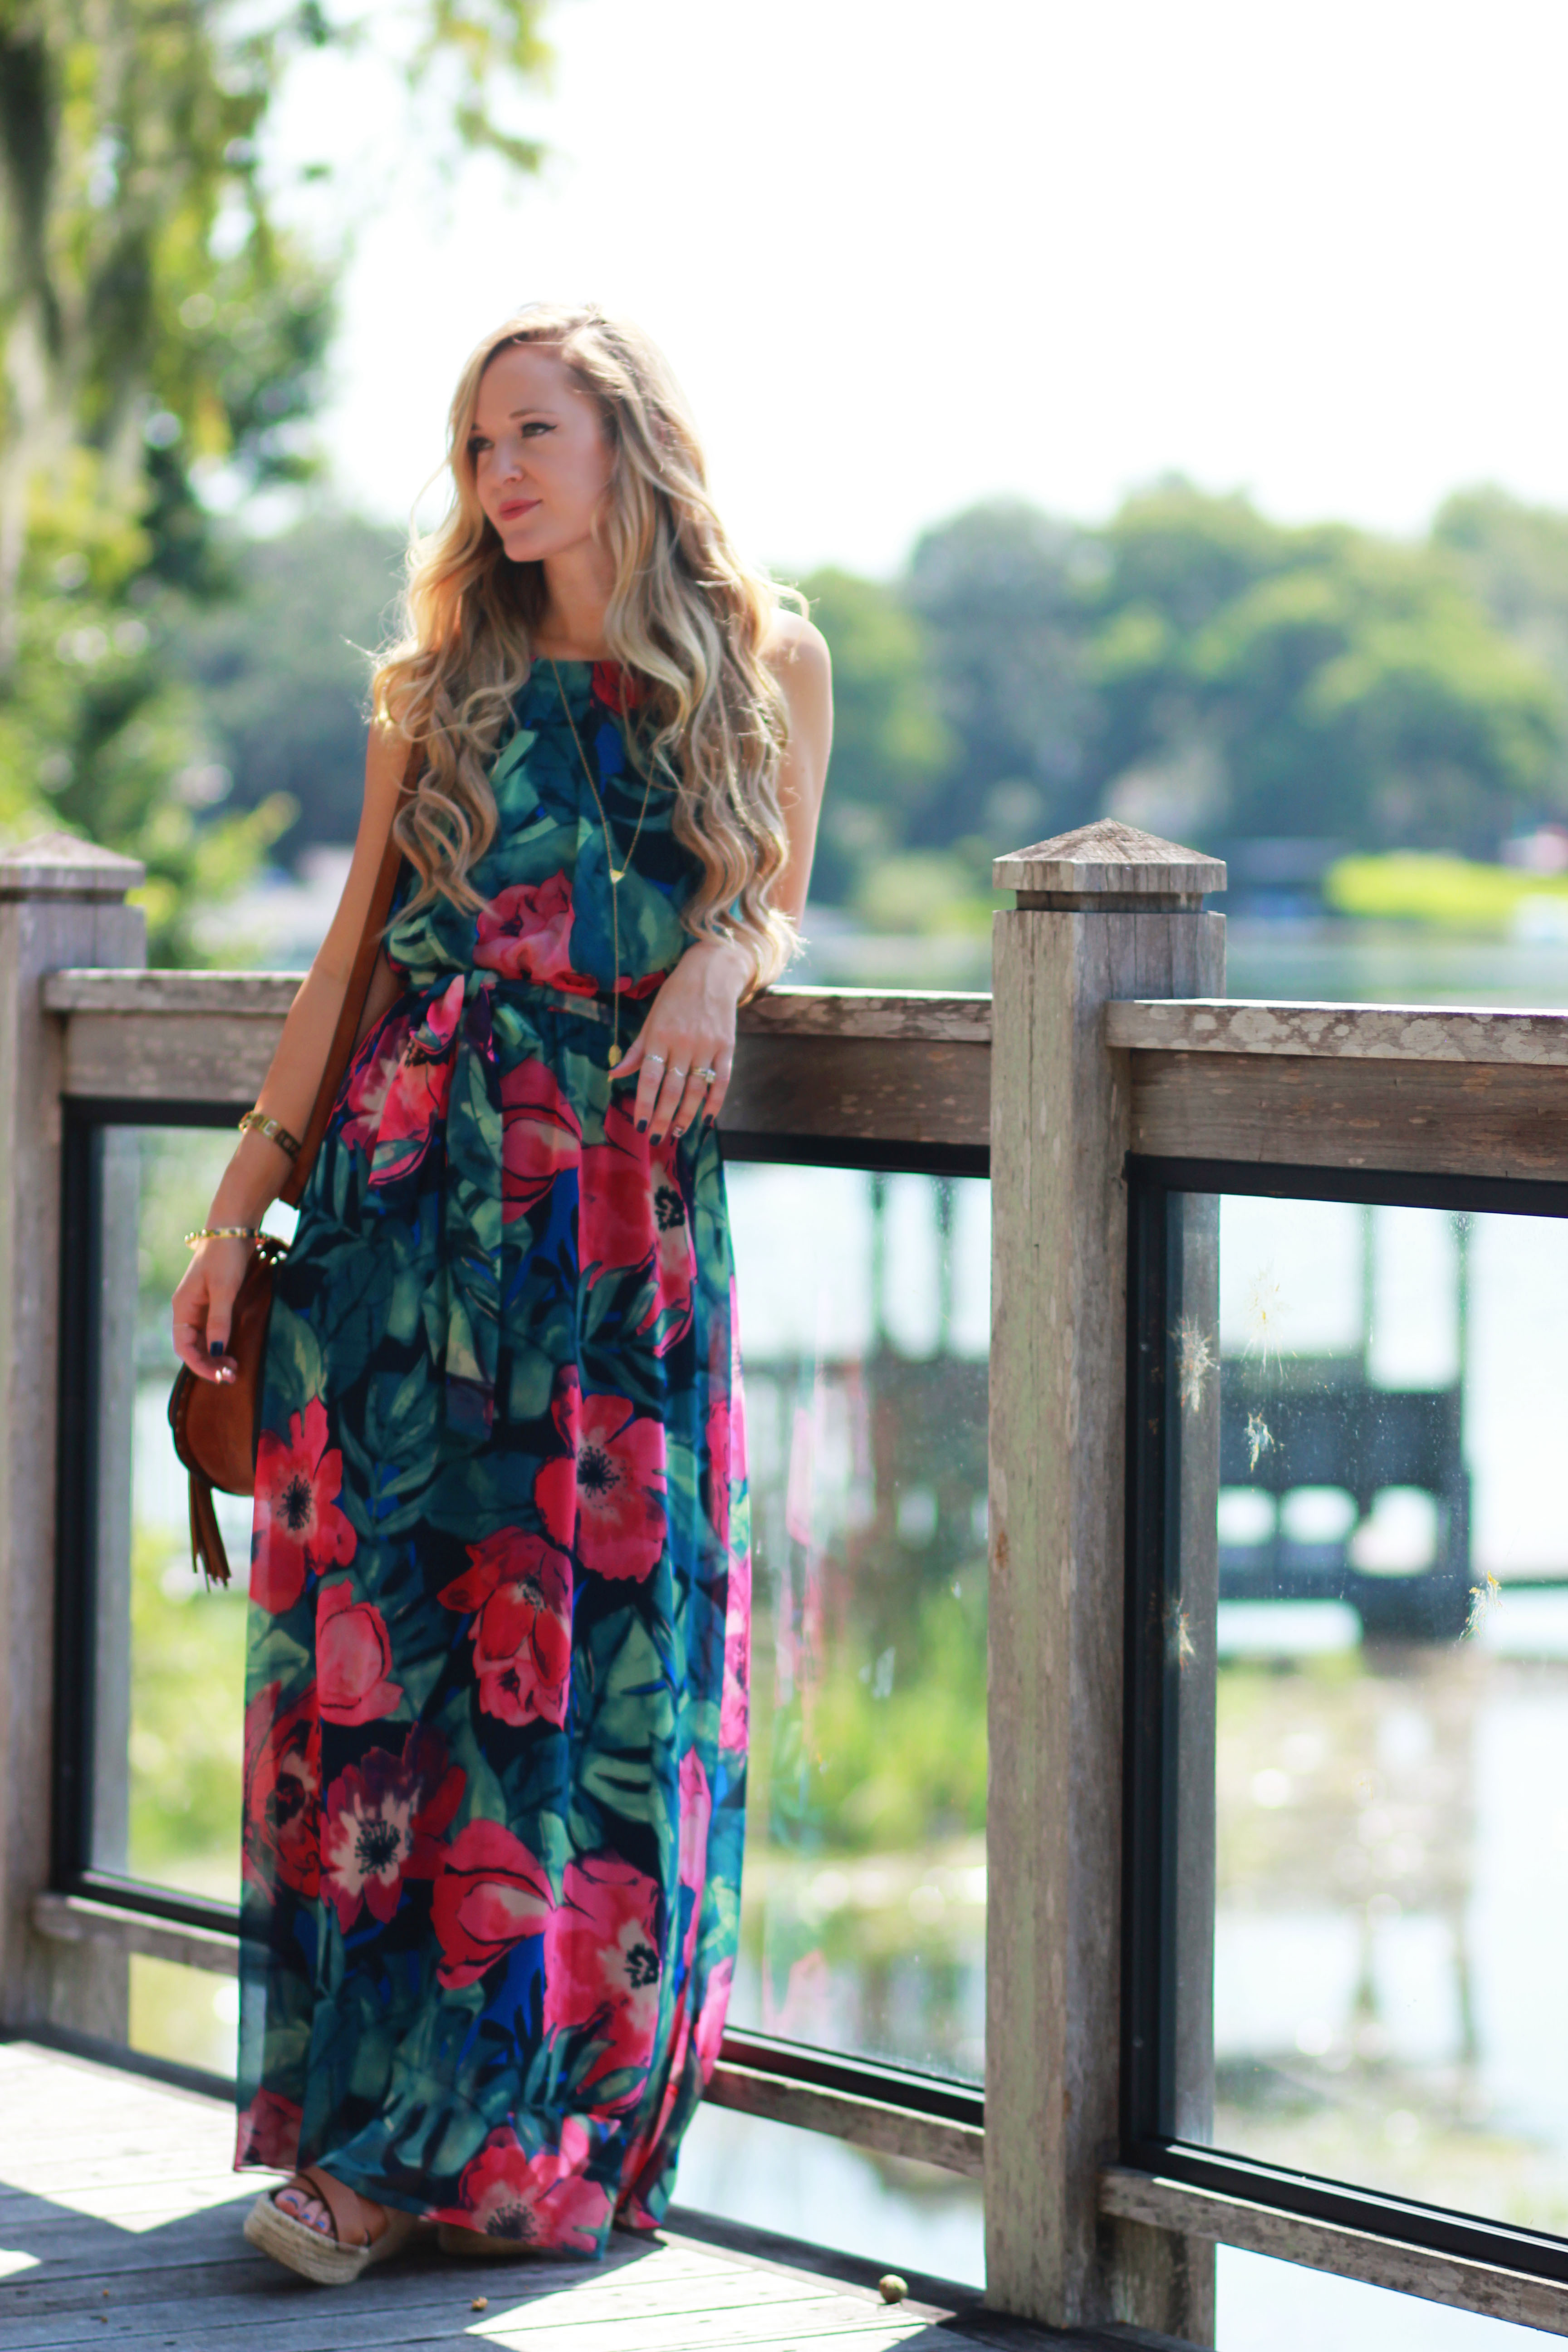 Tommy Bahama Tropical Maxi Upbeat Soles Florida Fashion Blog